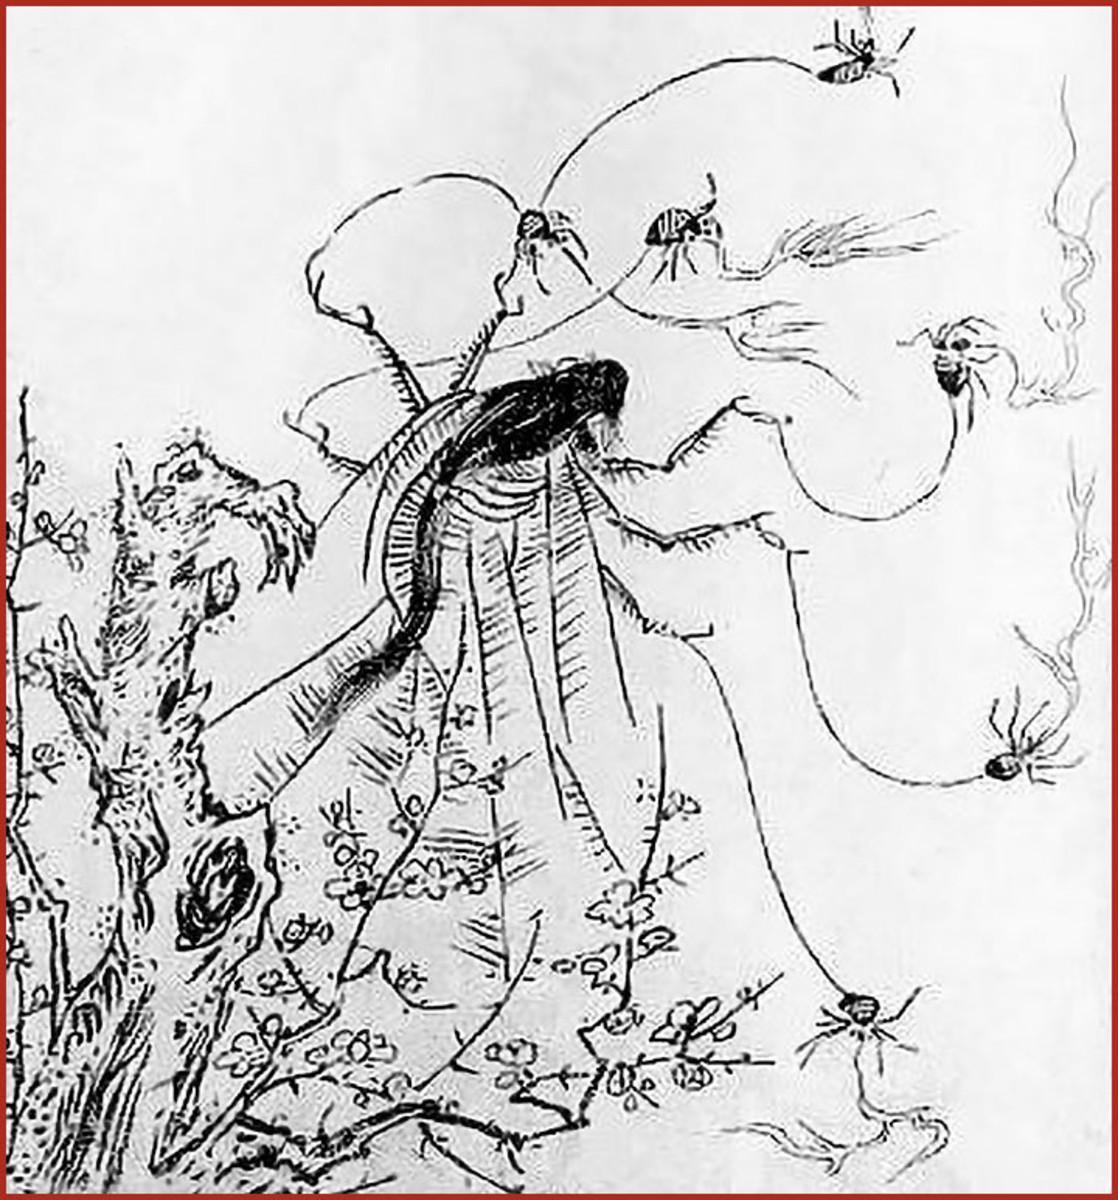 Classic illustration of a Jorōgumo by Edo Period artist, Toriyama Sekien.